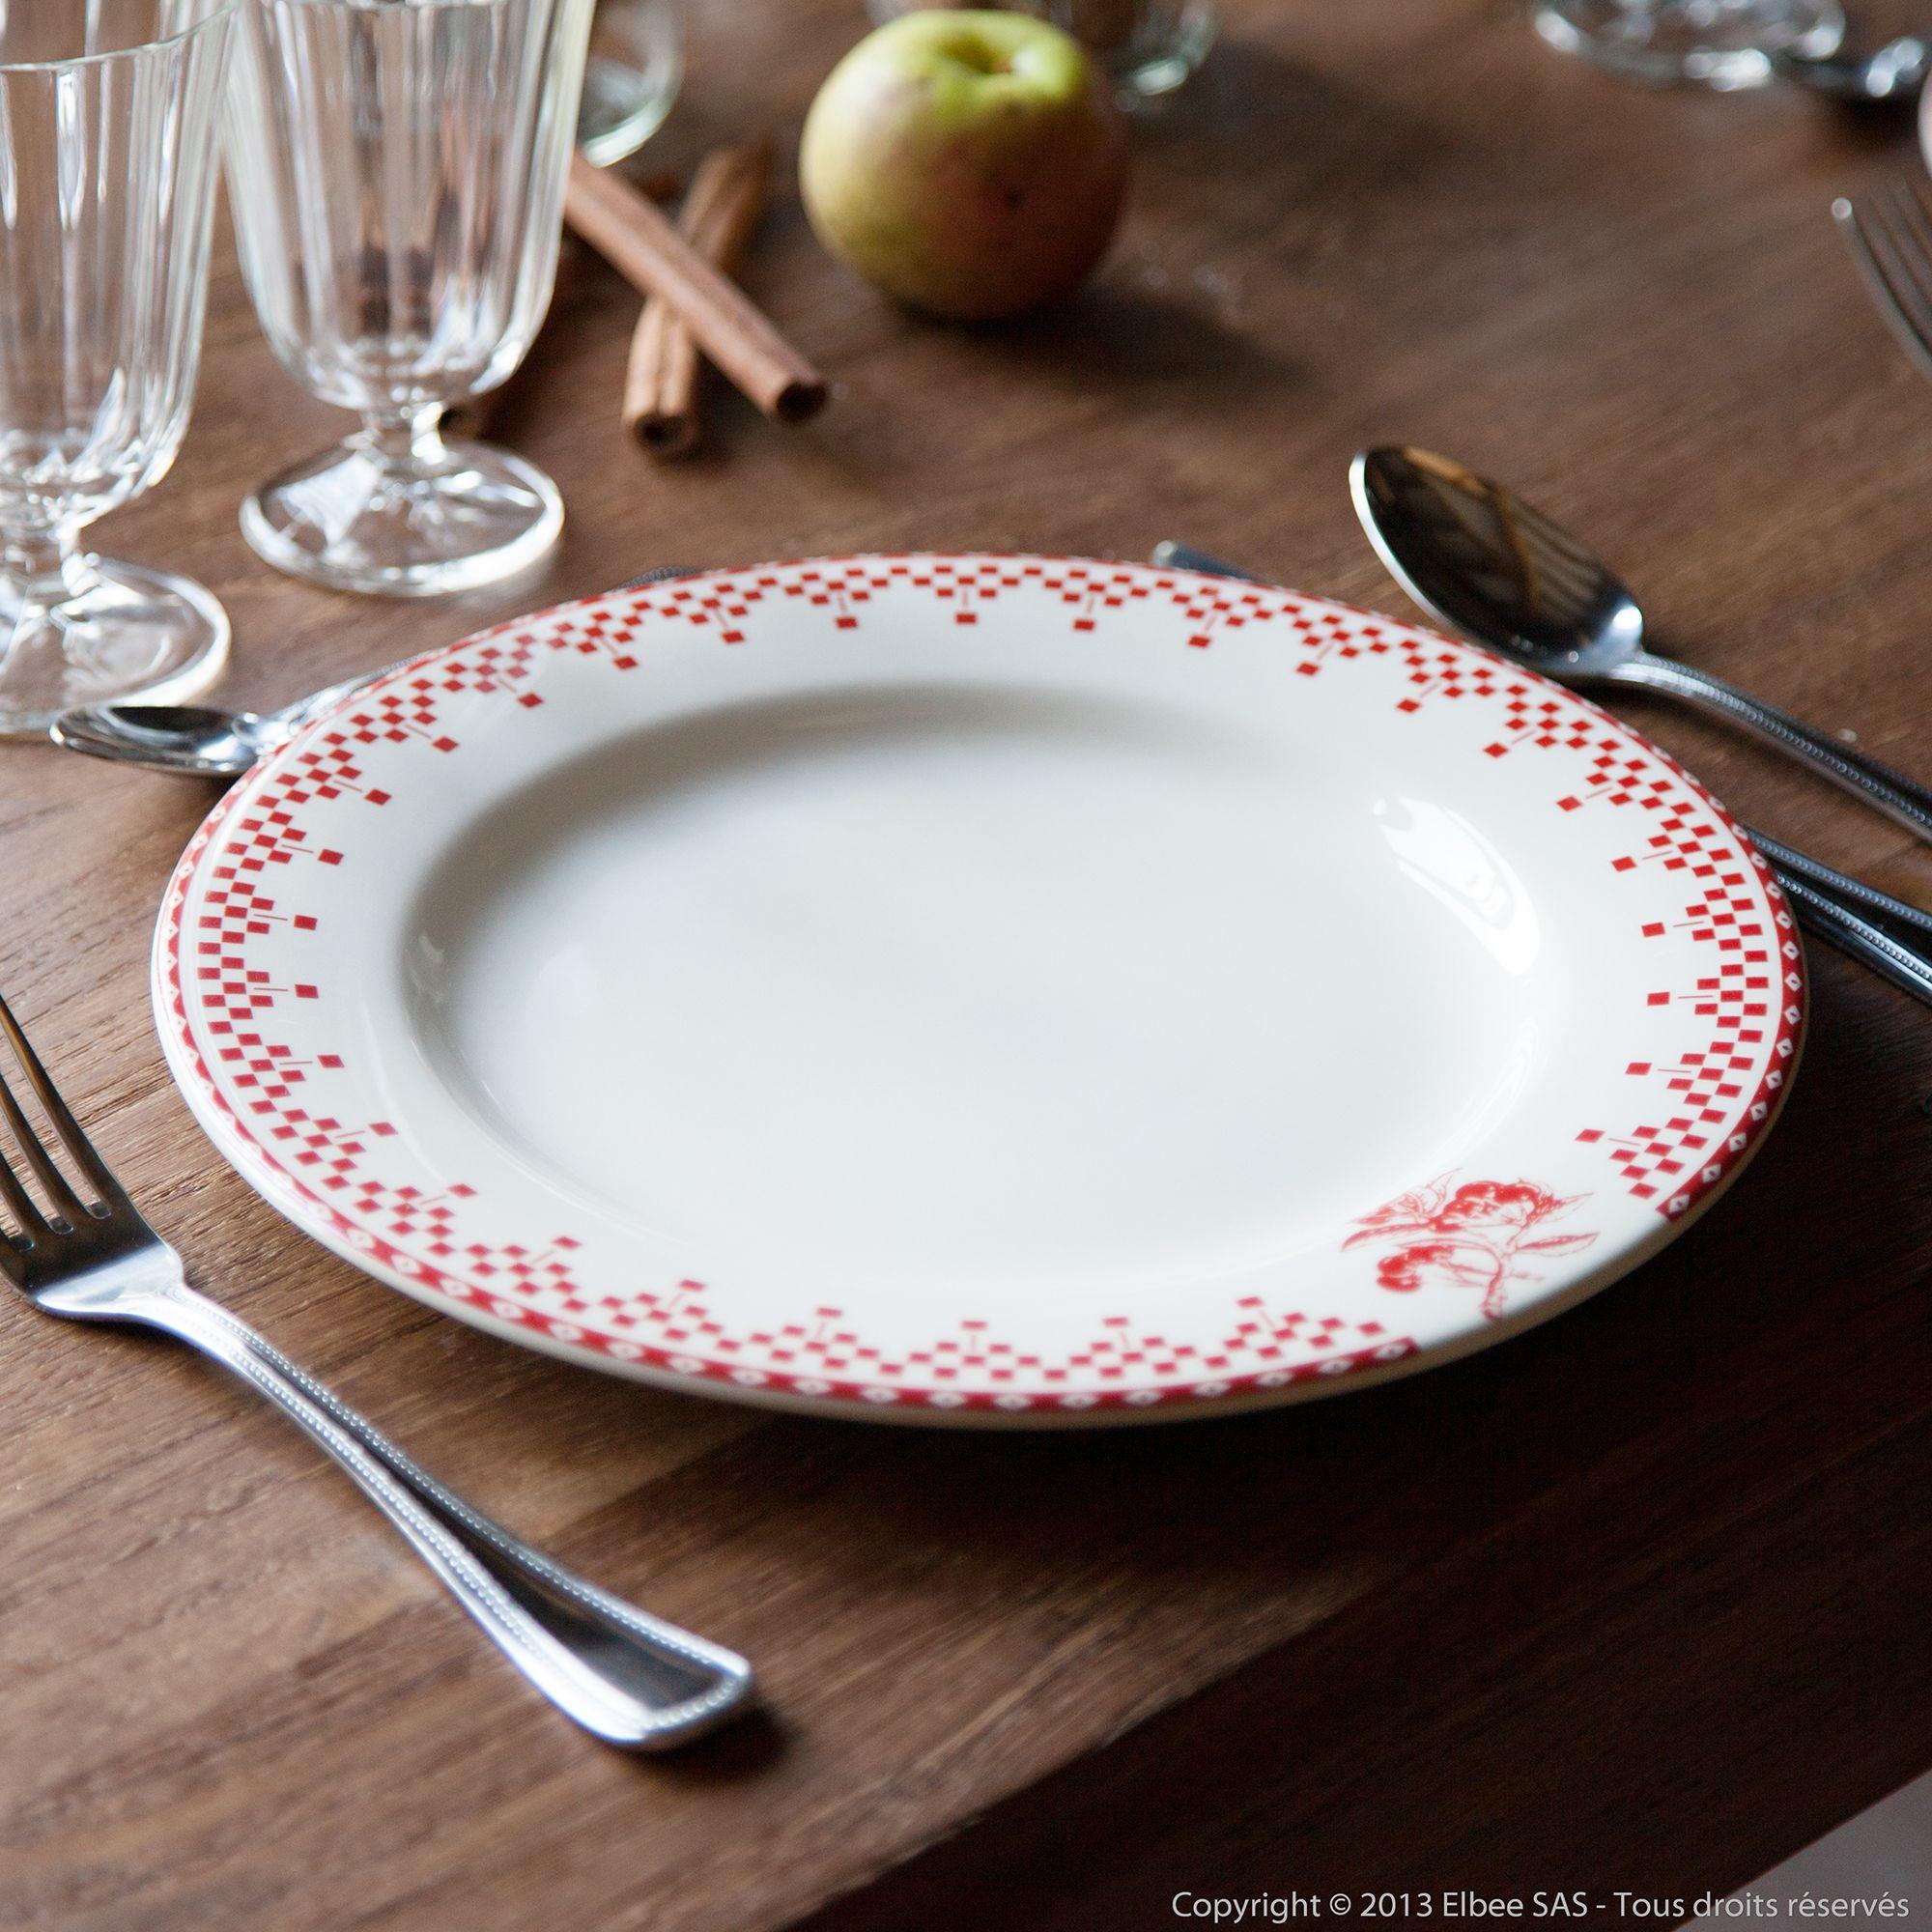 assiette plate en faience ivoire damier rouge damier rouge. Black Bedroom Furniture Sets. Home Design Ideas